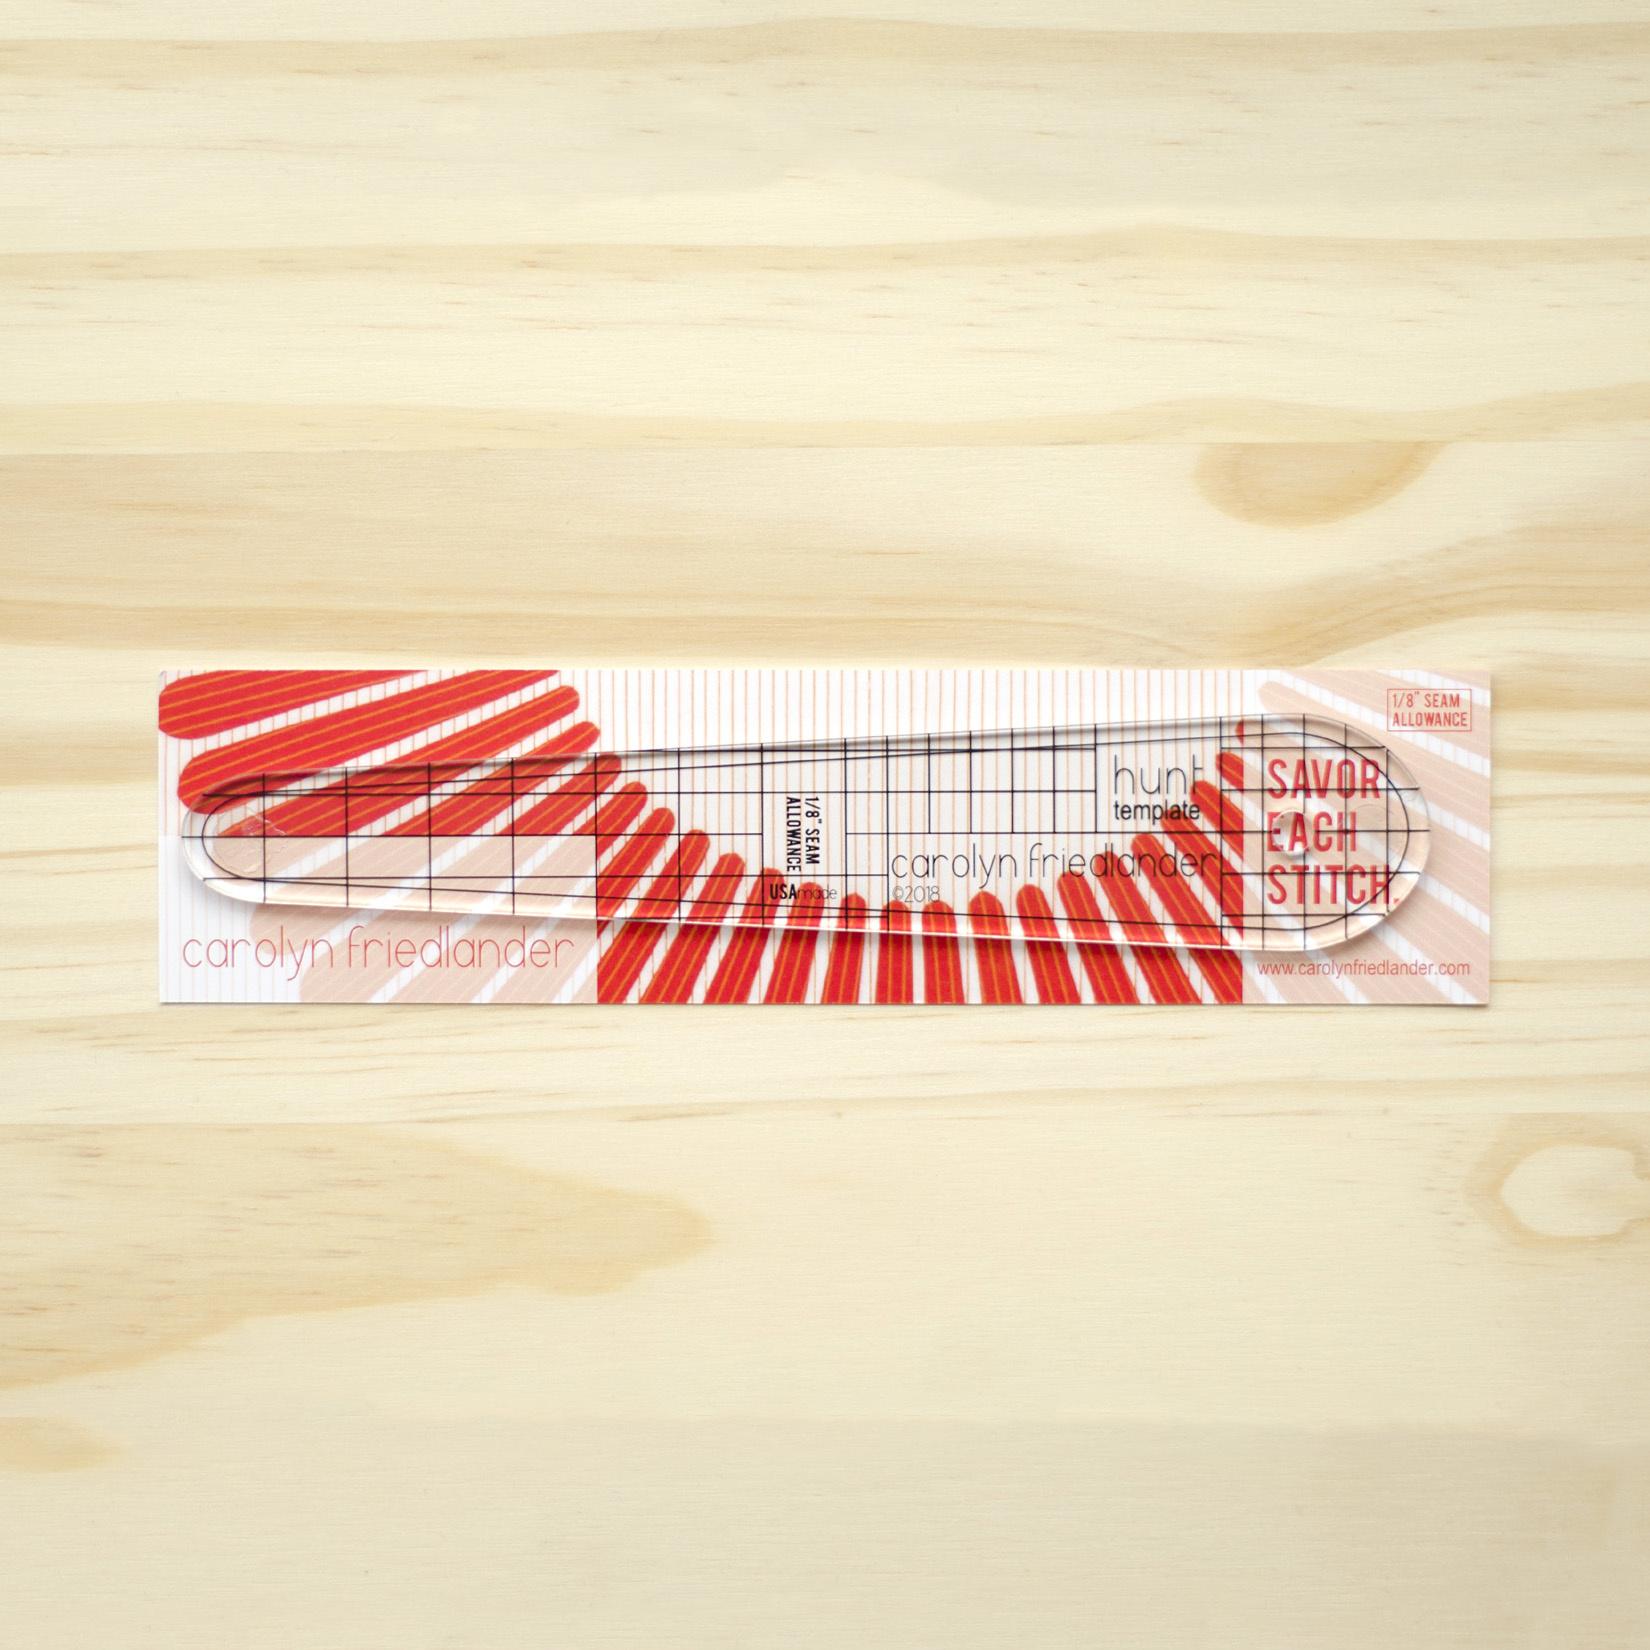 "Carolyn Friedlander : Hunt Quilt Acrylic Template : 1/8"" seam allowance"